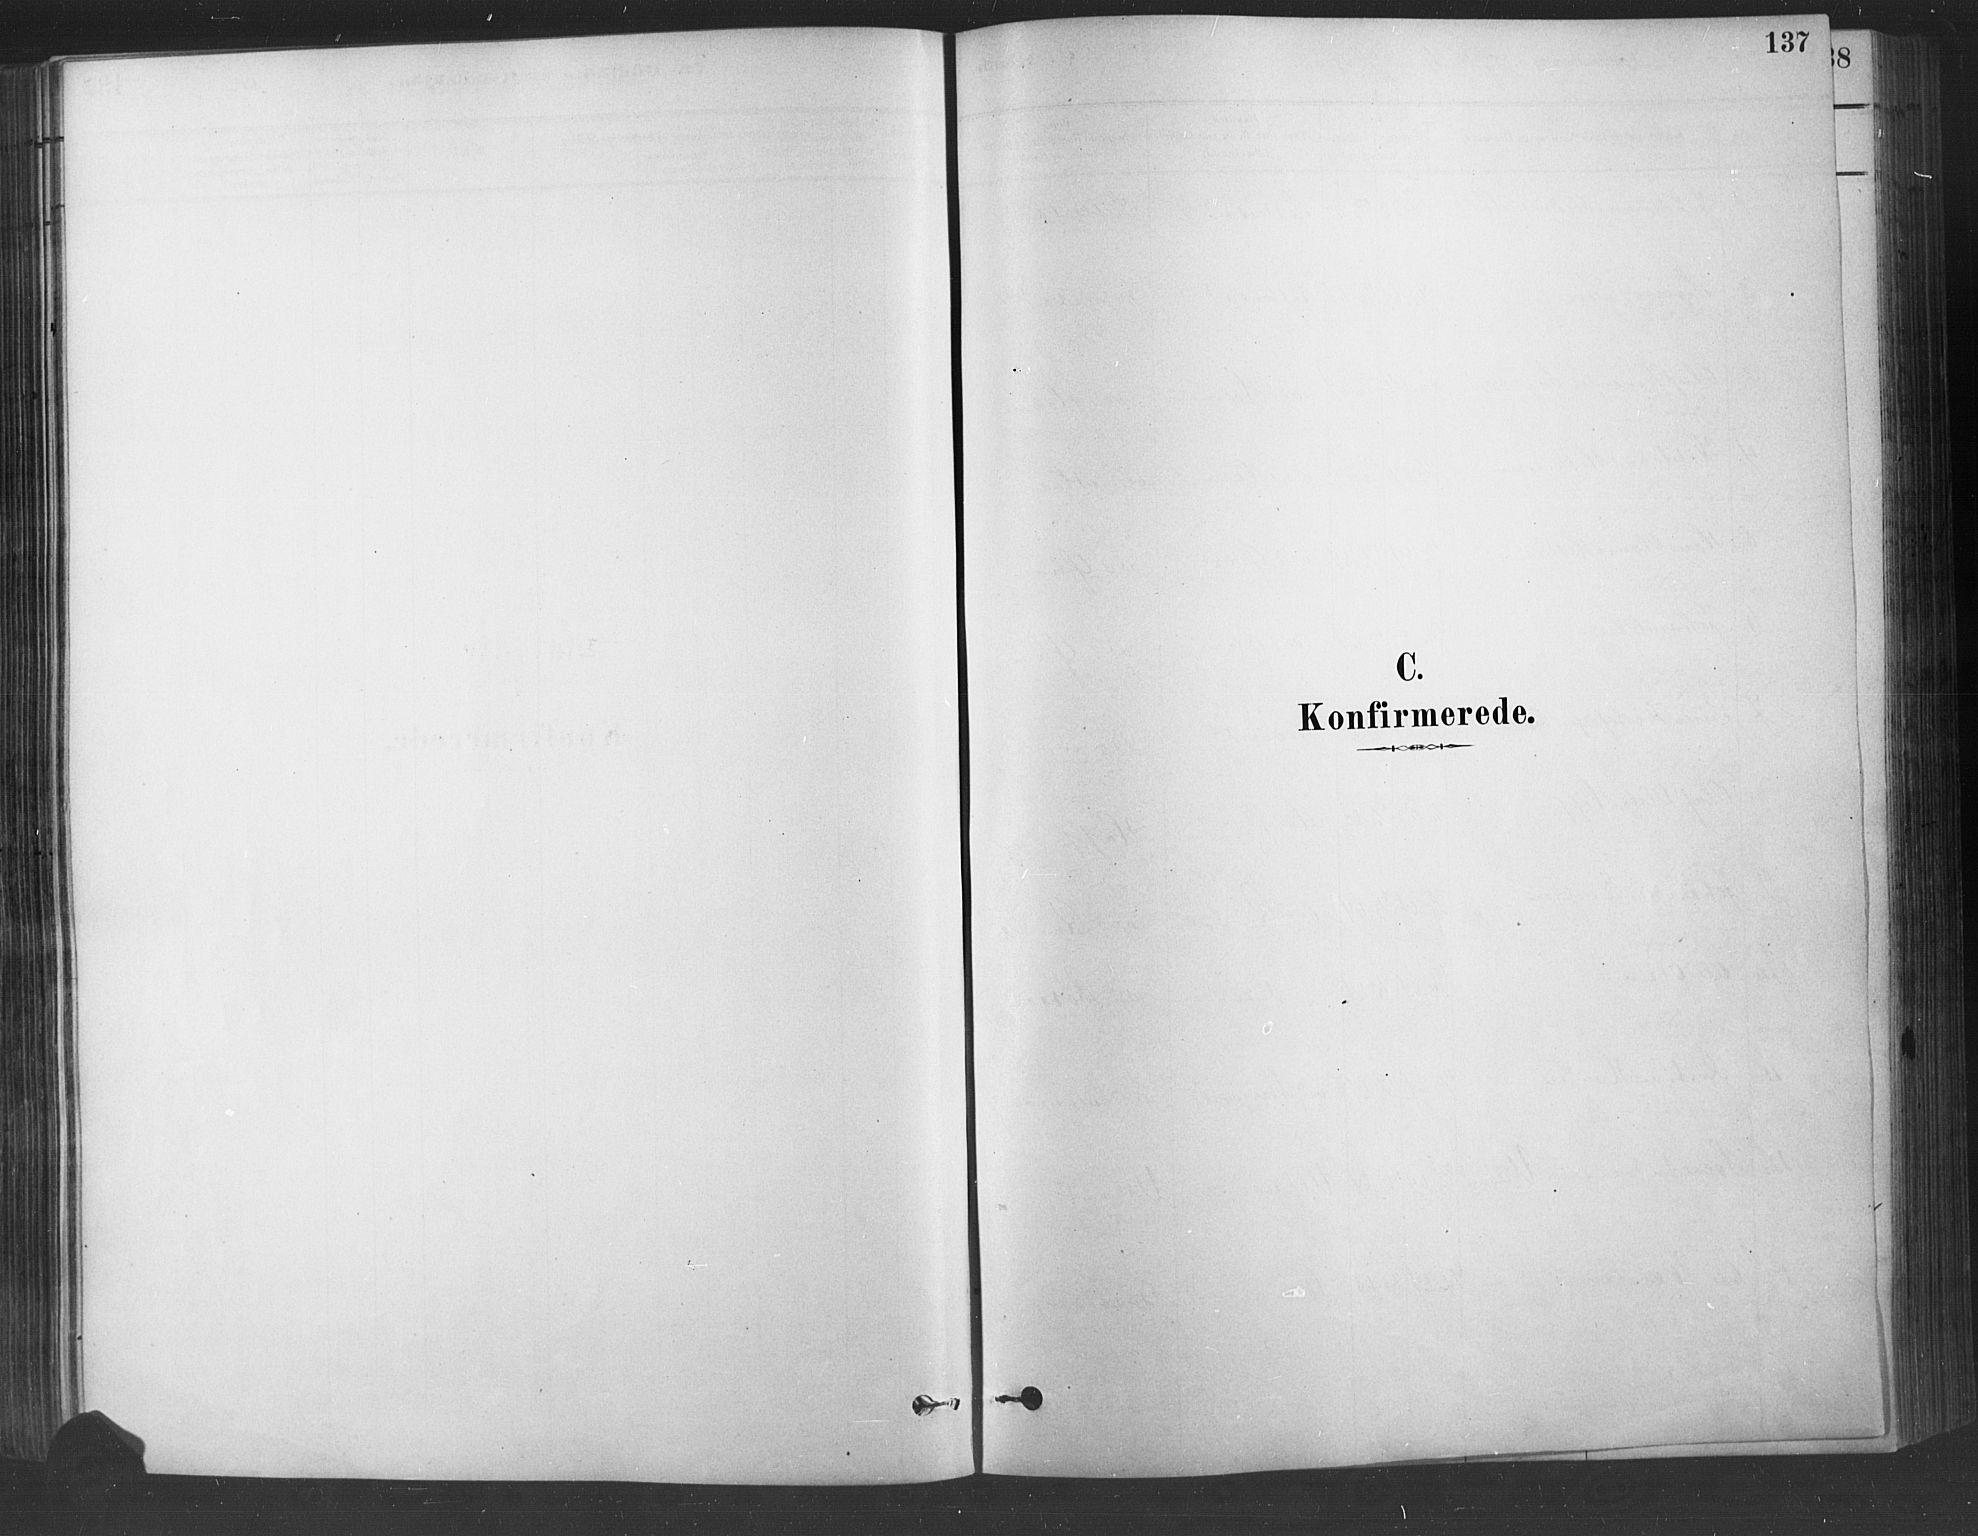 SAH, Fåberg prestekontor, Ministerialbok nr. 9, 1879-1898, s. 137